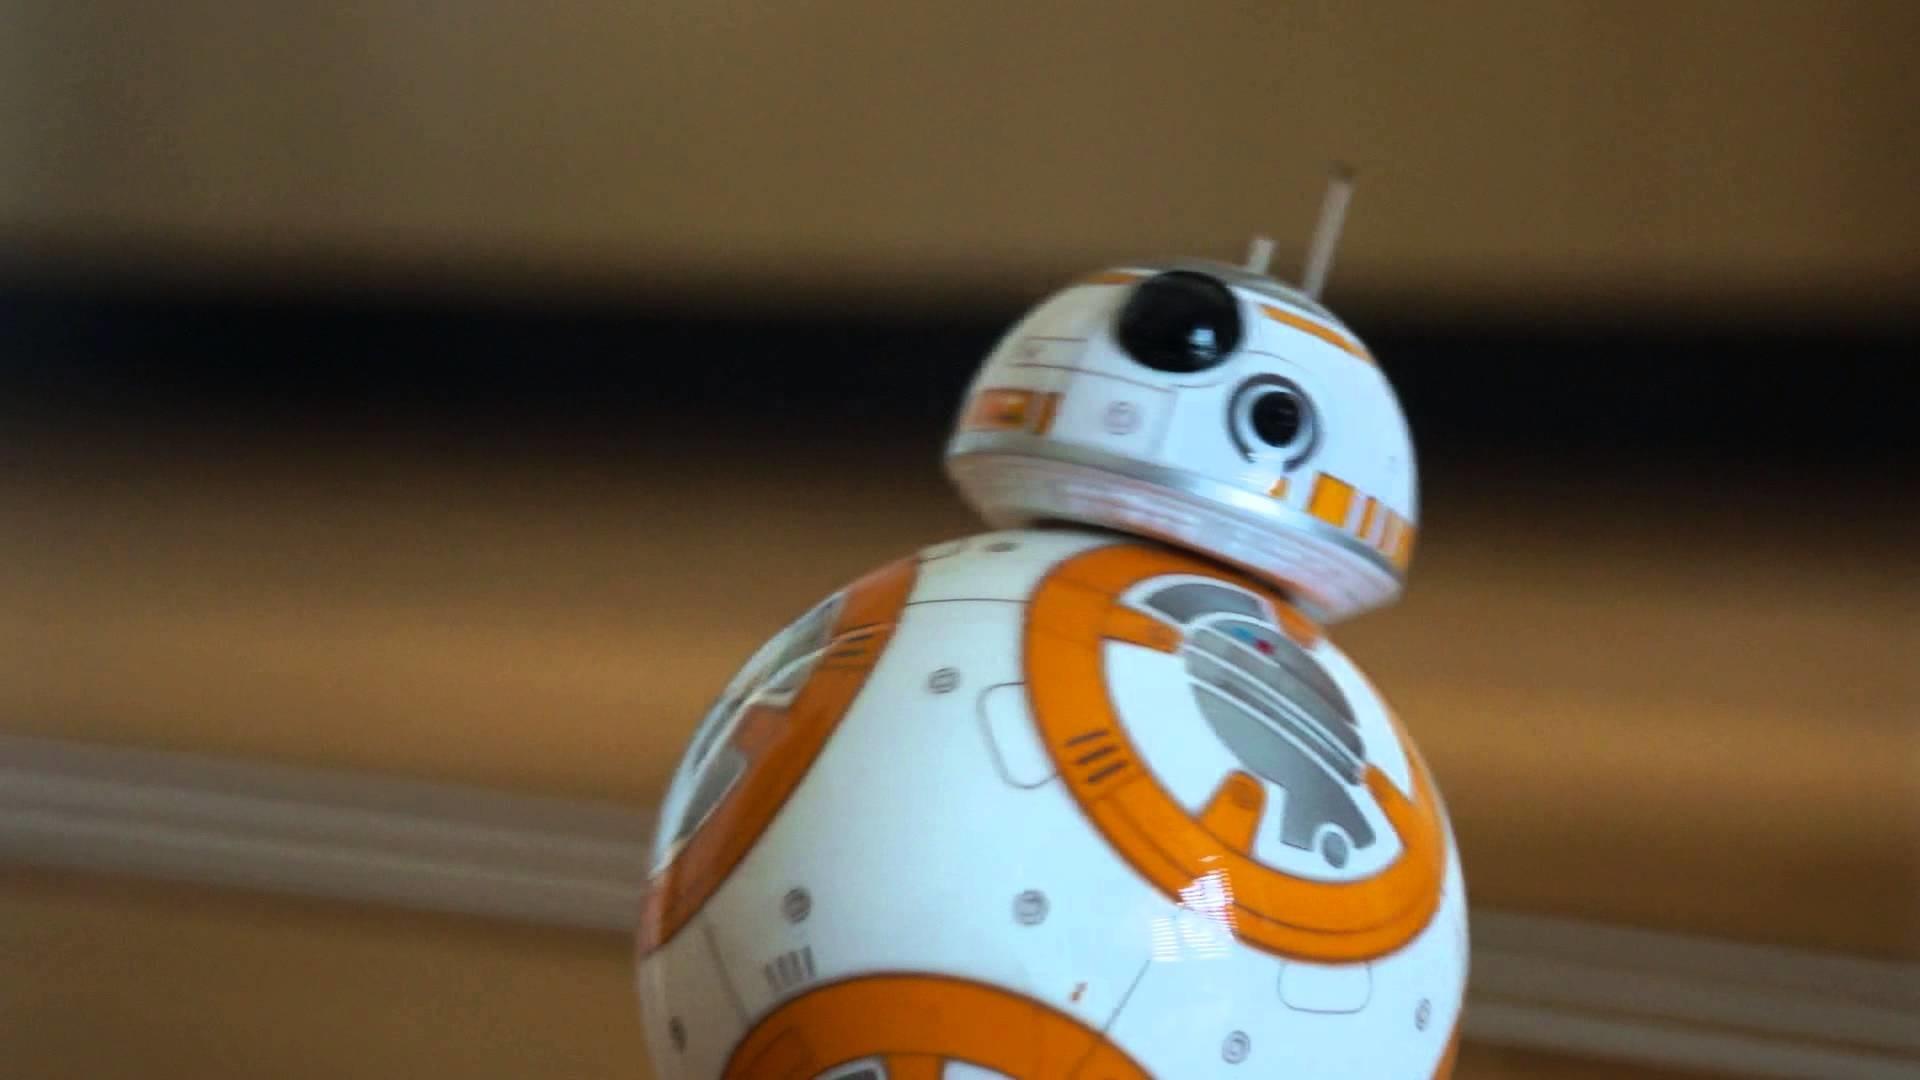 BB8 saying HELLO (waking up) Sphero BB-8 in action Star Wars Episode VII  part1